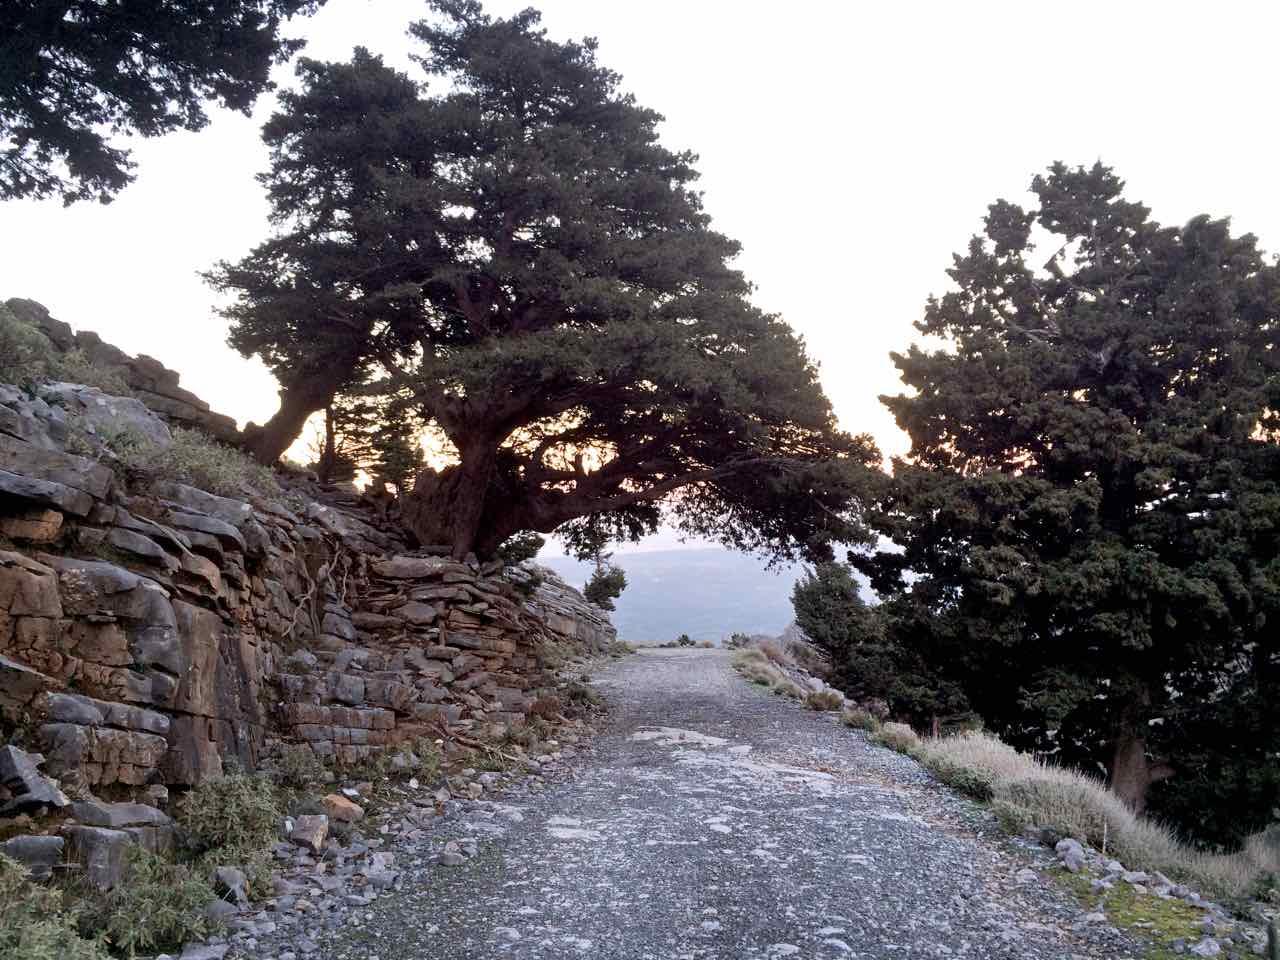 Explore the white mountains of Crete, jeep safari white mountains, visit traditional Cretan villages, learn Cretan history, learn traditions of Crete, lifestyle of a Cretan shepherd, original shepherd's hut visit, best activities chania crete, best jeep safari tours crete